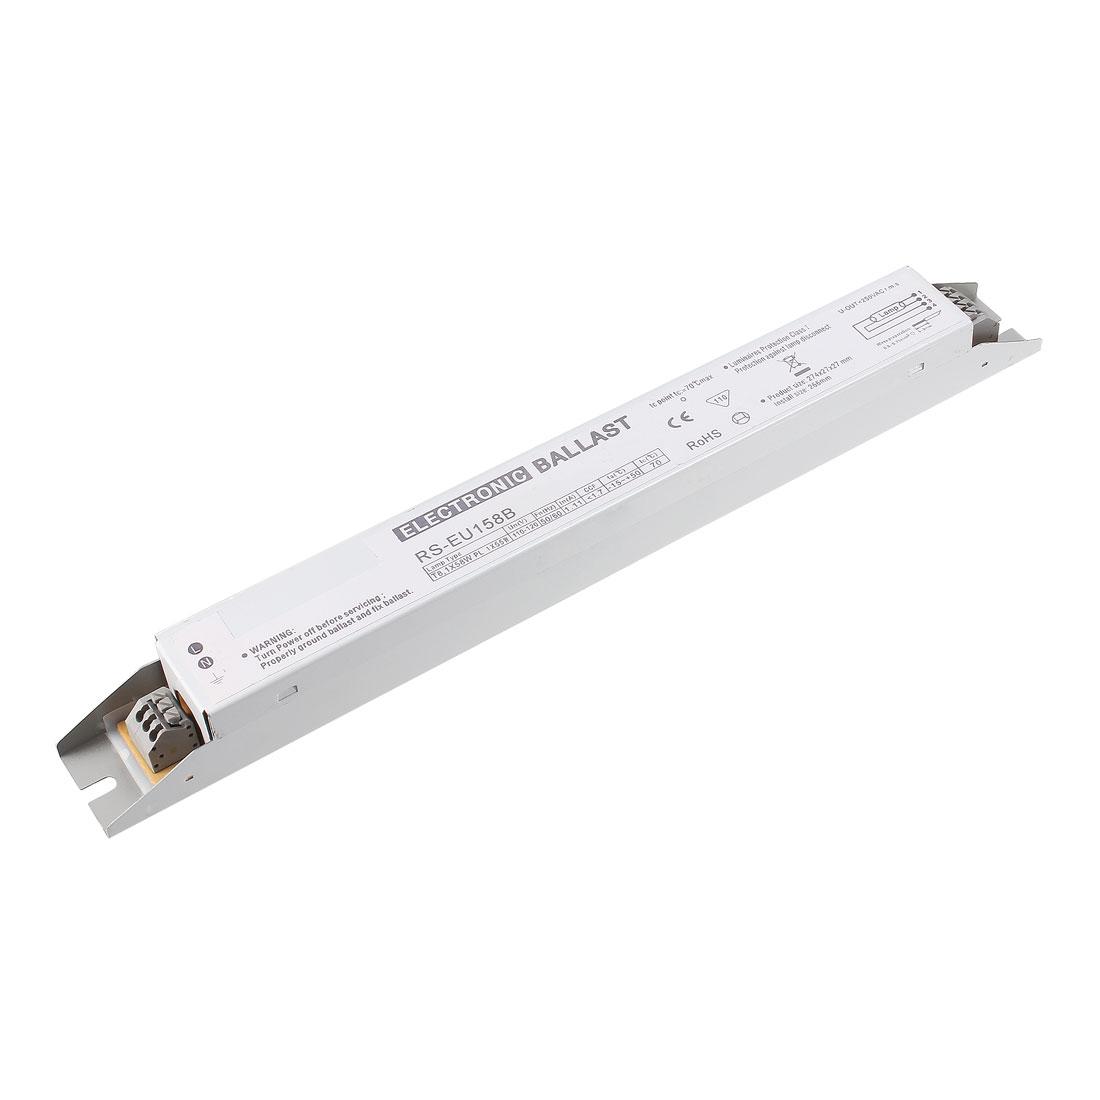 Electronic Ballast 110/120-Volt 55/58-Watt Fluorescent Lamp T8 Ballasts